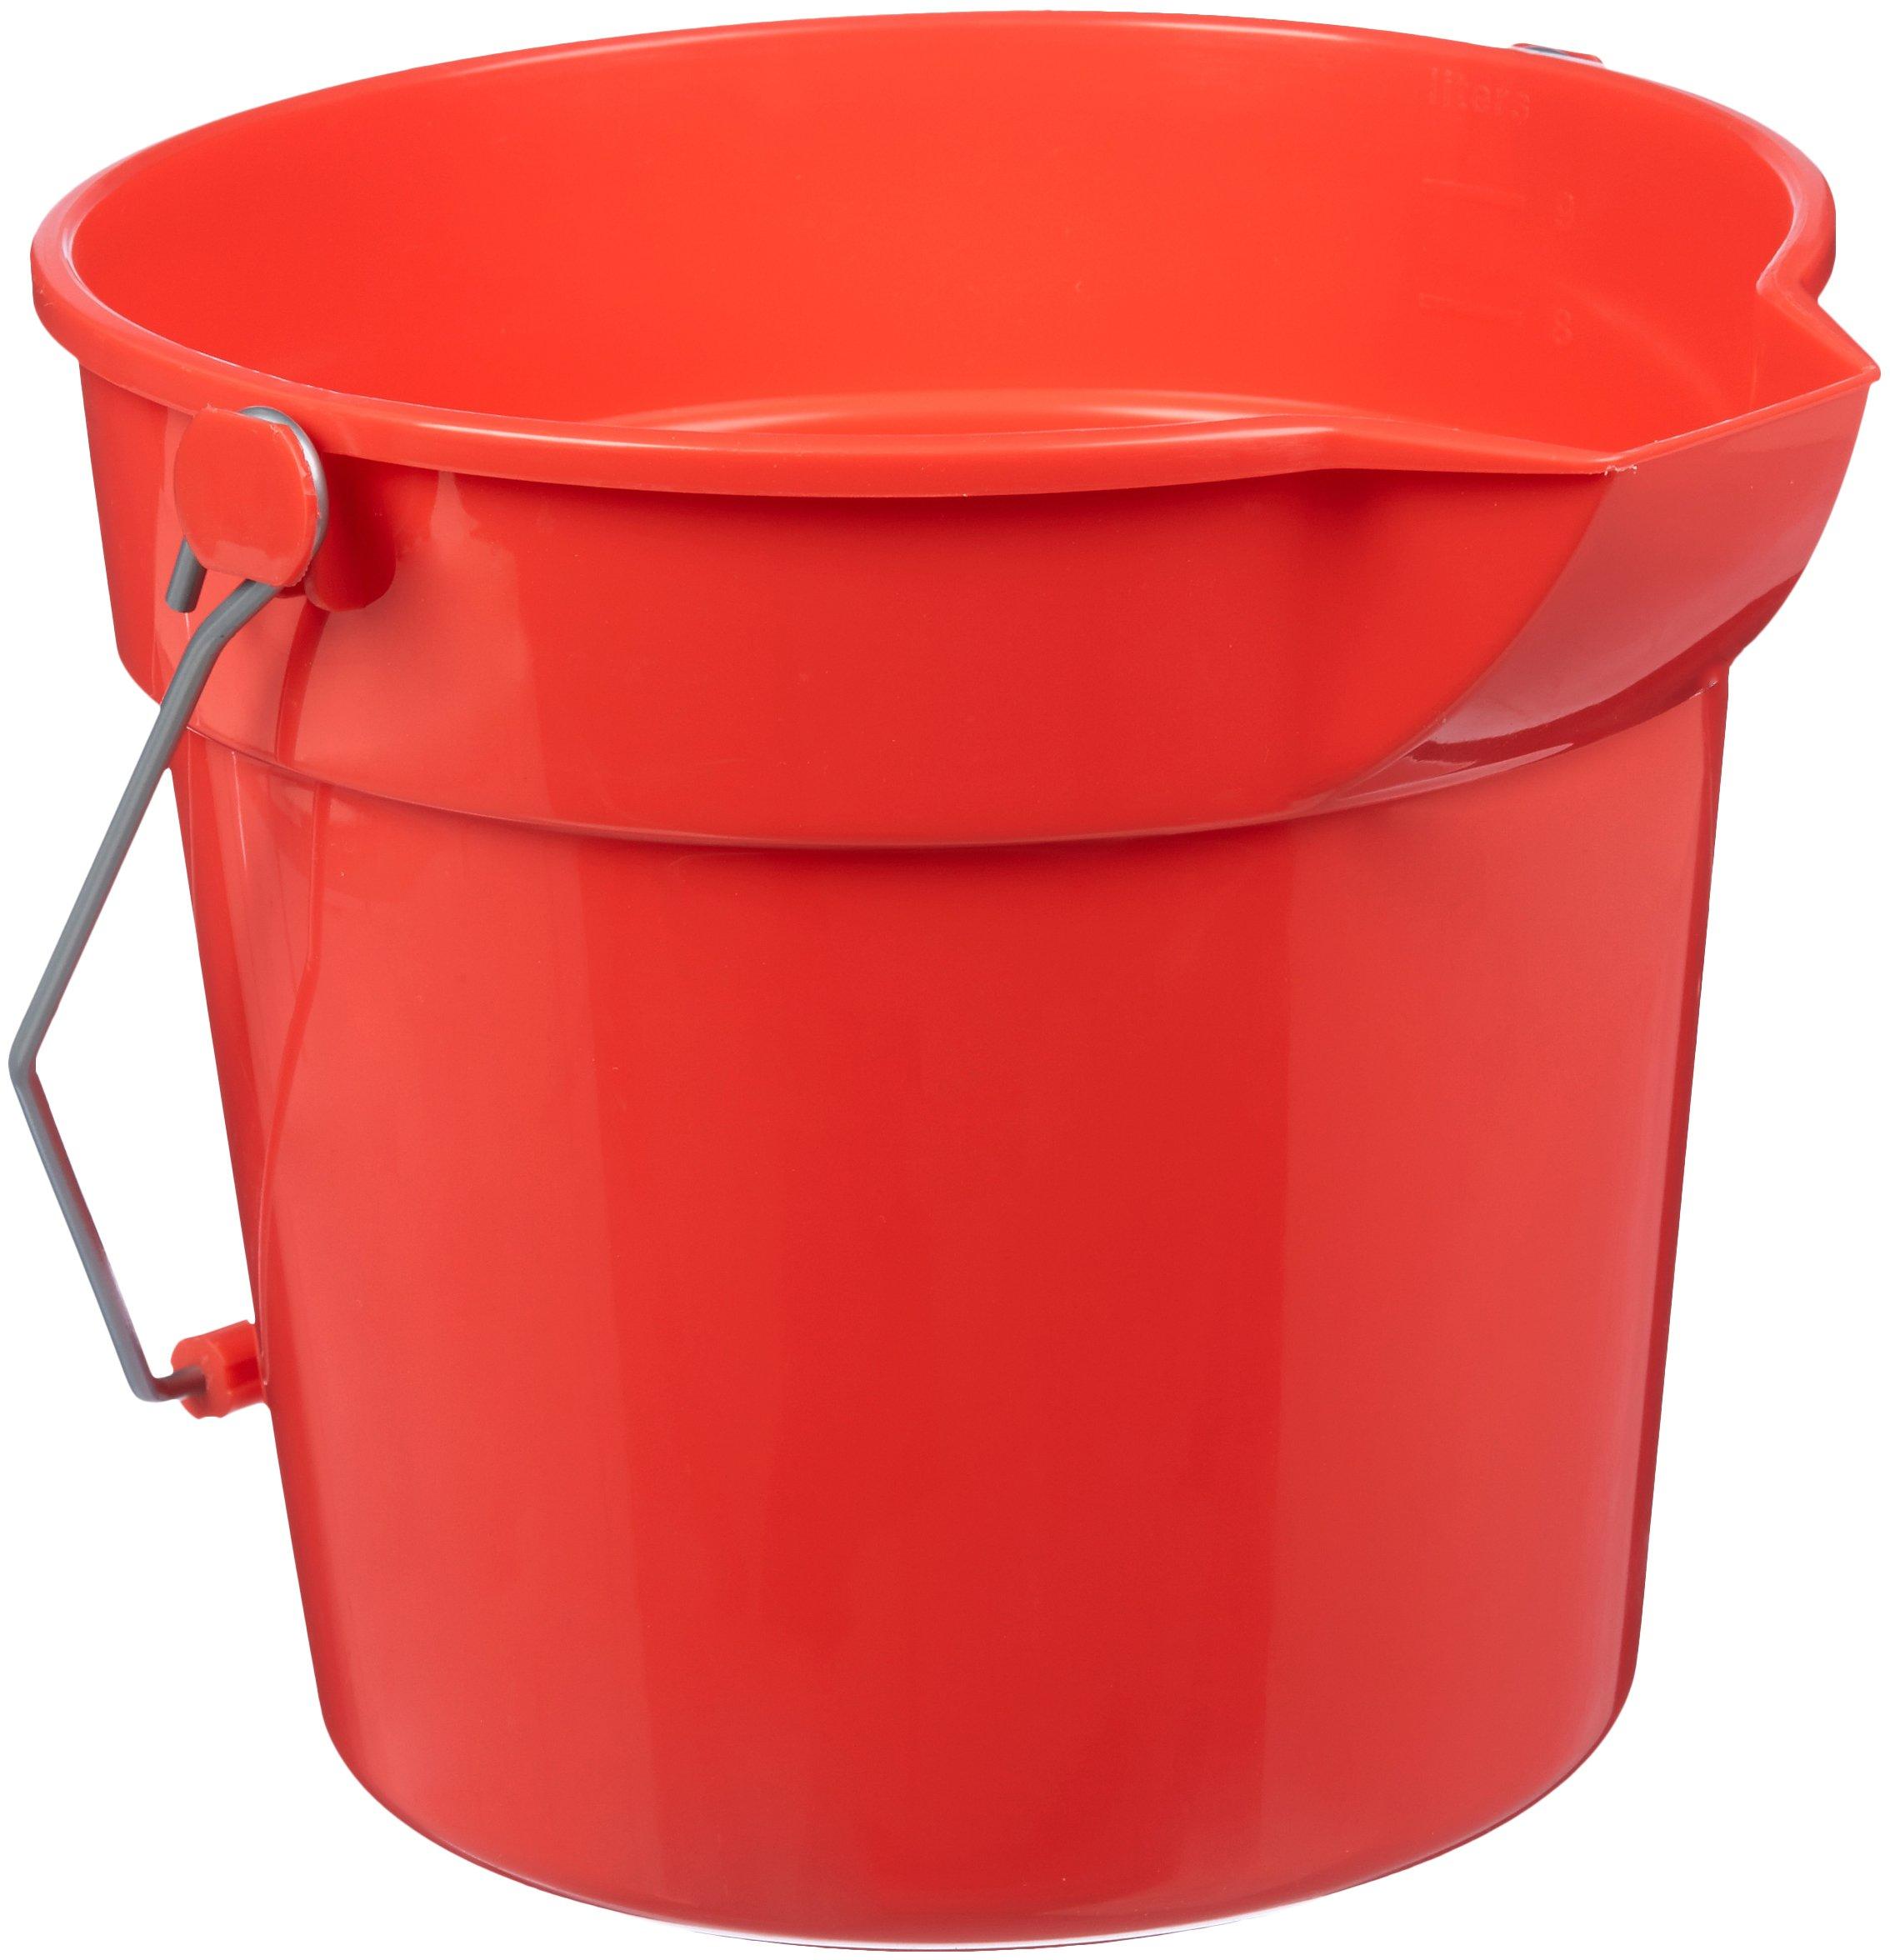 AmazonBasics 10 Quart Plastic Cleaning Bucket, Red - 6-Pack